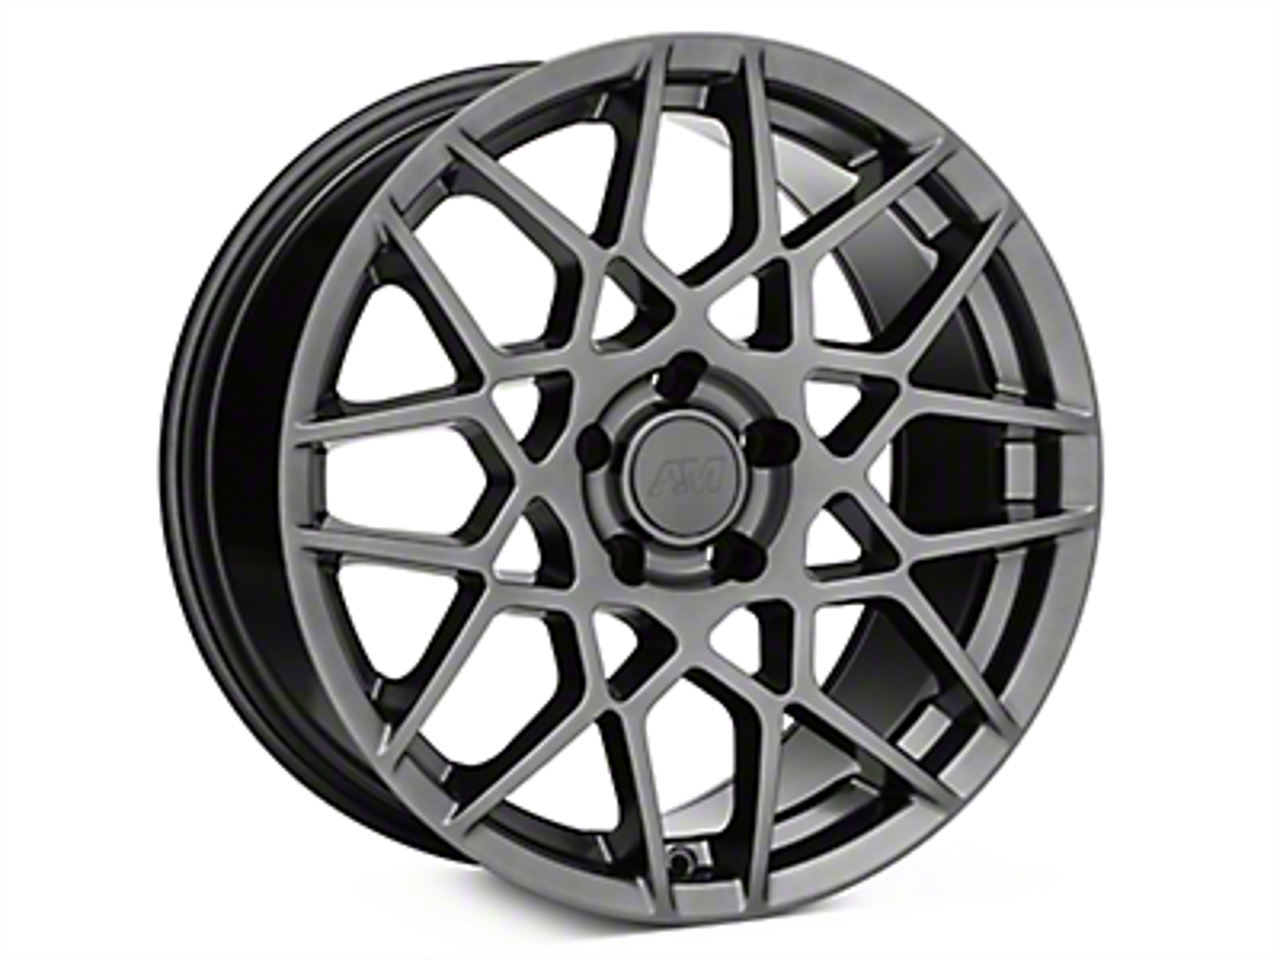 2013 GT500 Style Hyper Dark Wheel - 18x9 (15-19 EcoBoost, V6)